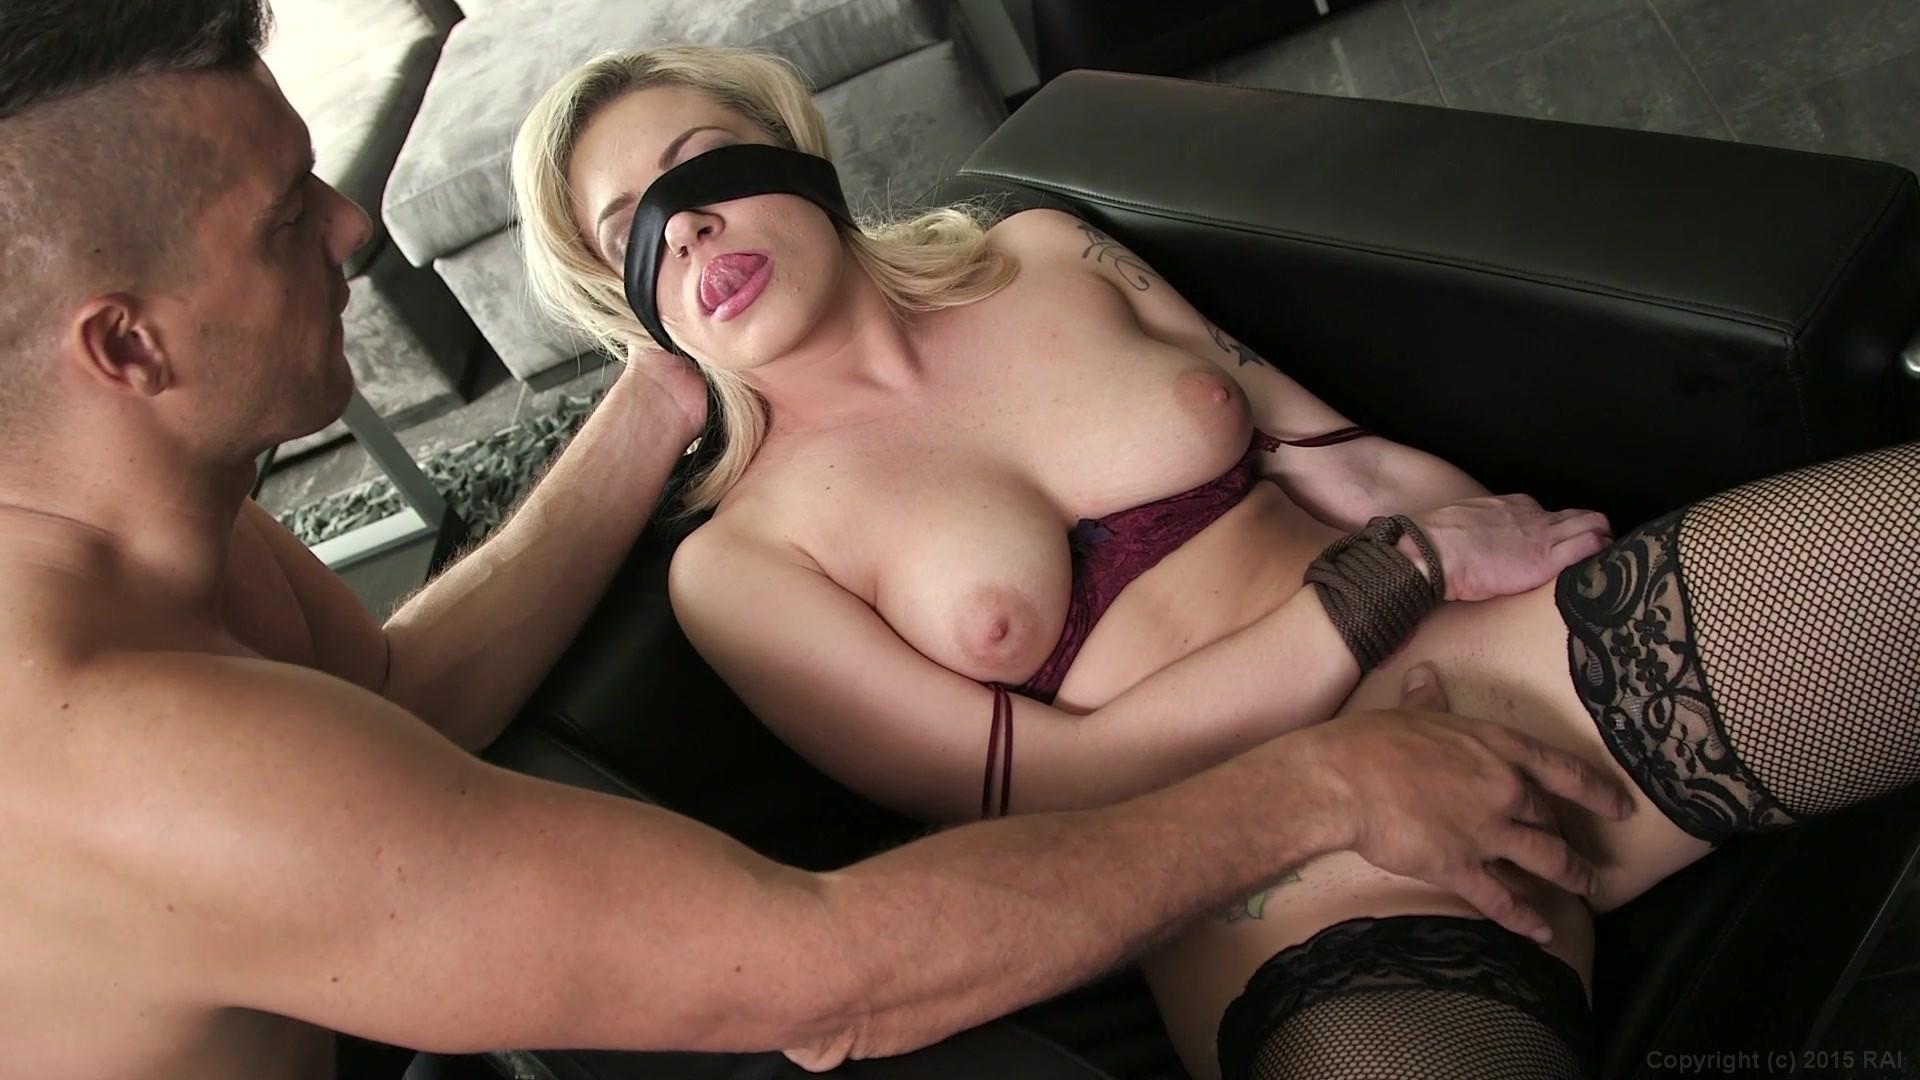 Blindfolded Best Porn Pics